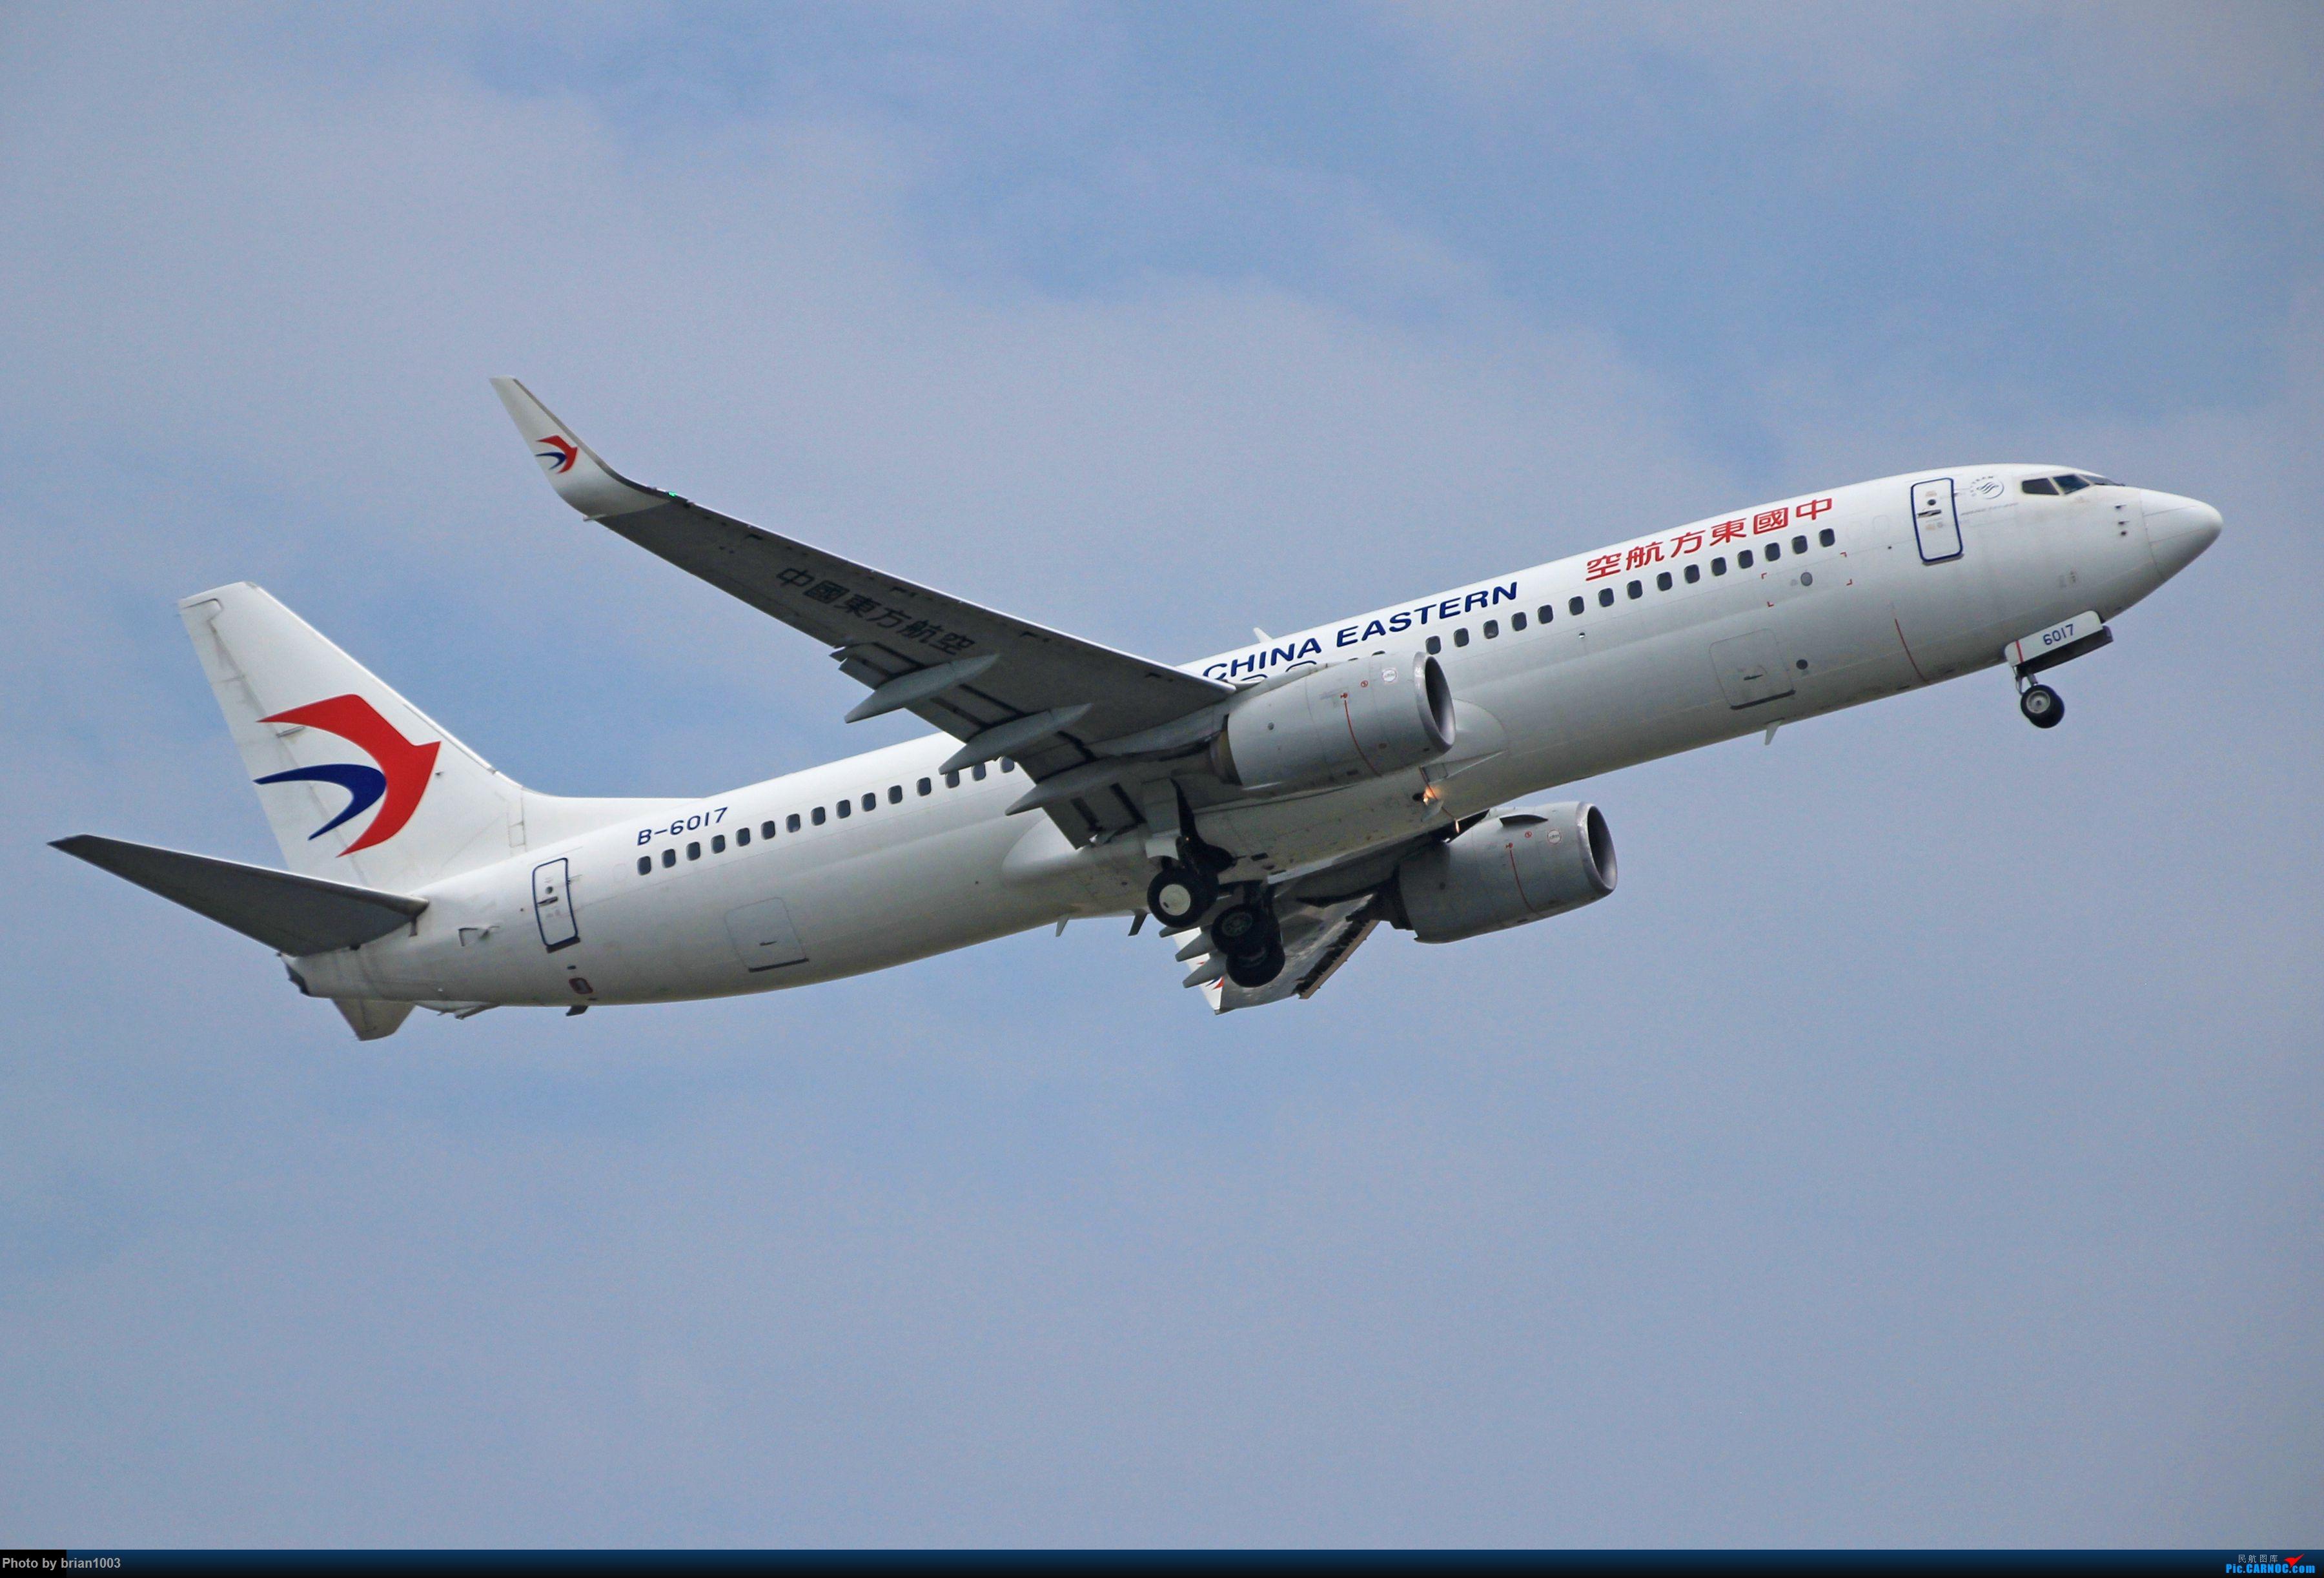 Re:[原创]WUH天河机场拍机之六月还有啥(X7家744F、天津大韩港龙333、巴基斯坦772、B6419、ER-BBJ 74F、某菊塞斯纳、俄航国航77W) BOEING 737-800 B-6017 中国武汉天河国际机场